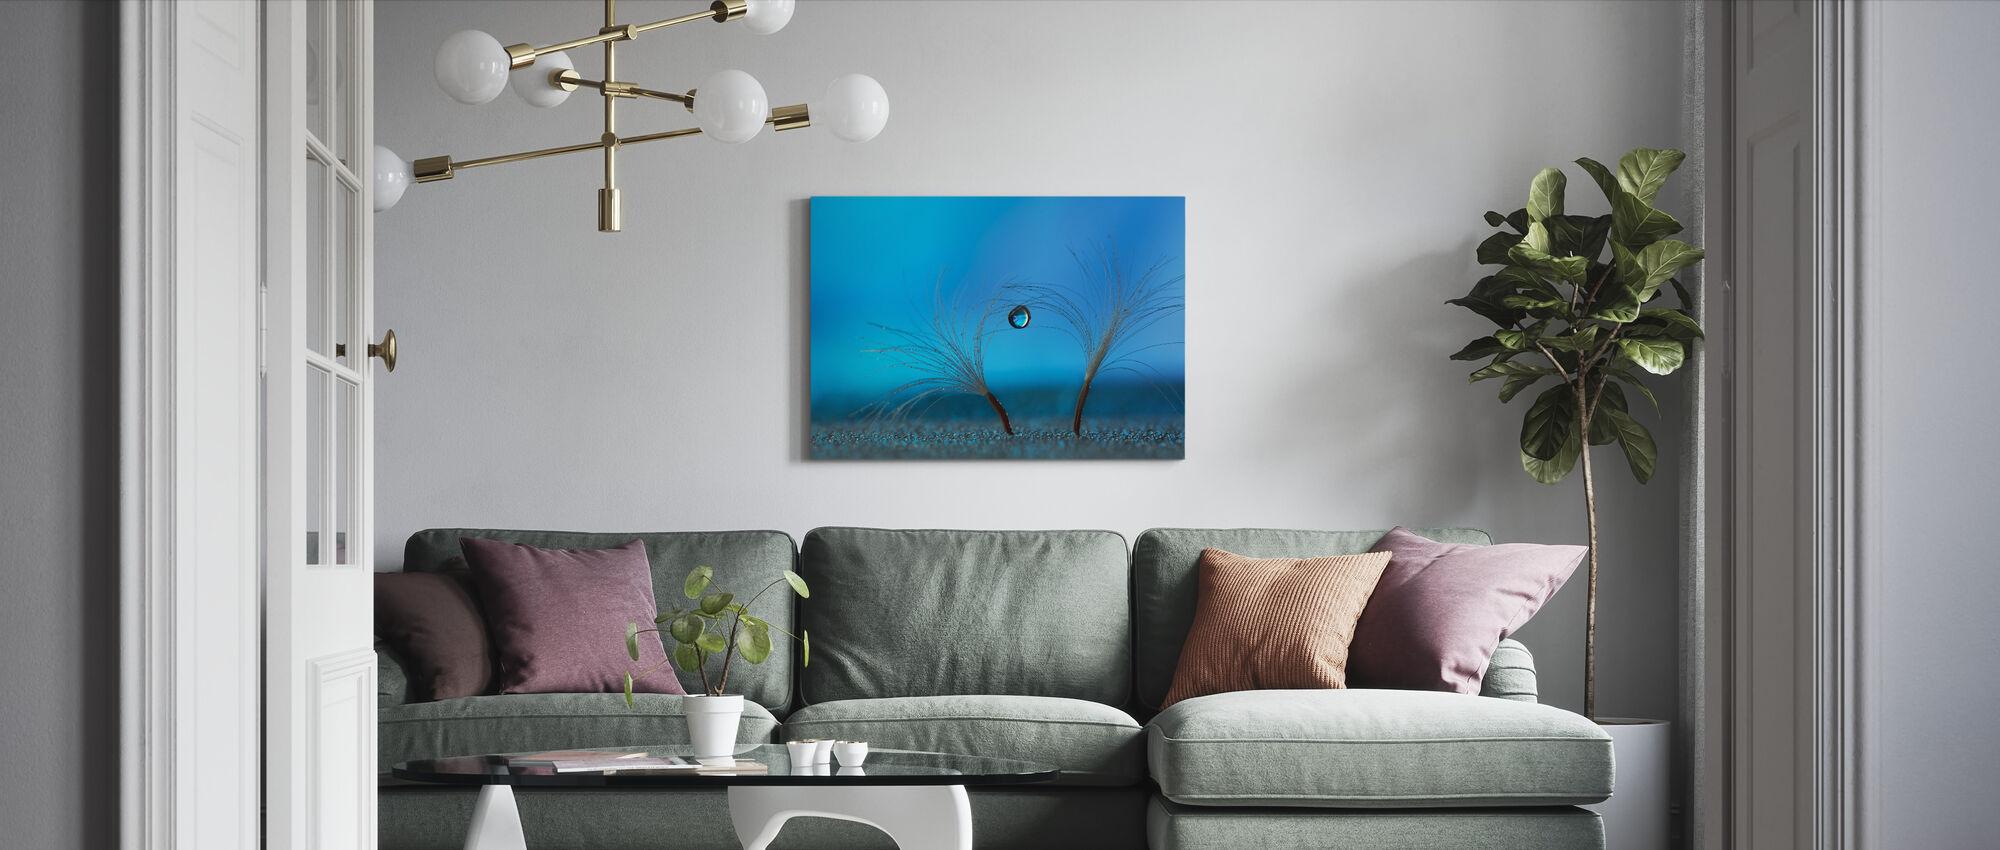 Keep the Balance - Canvas print - Living Room